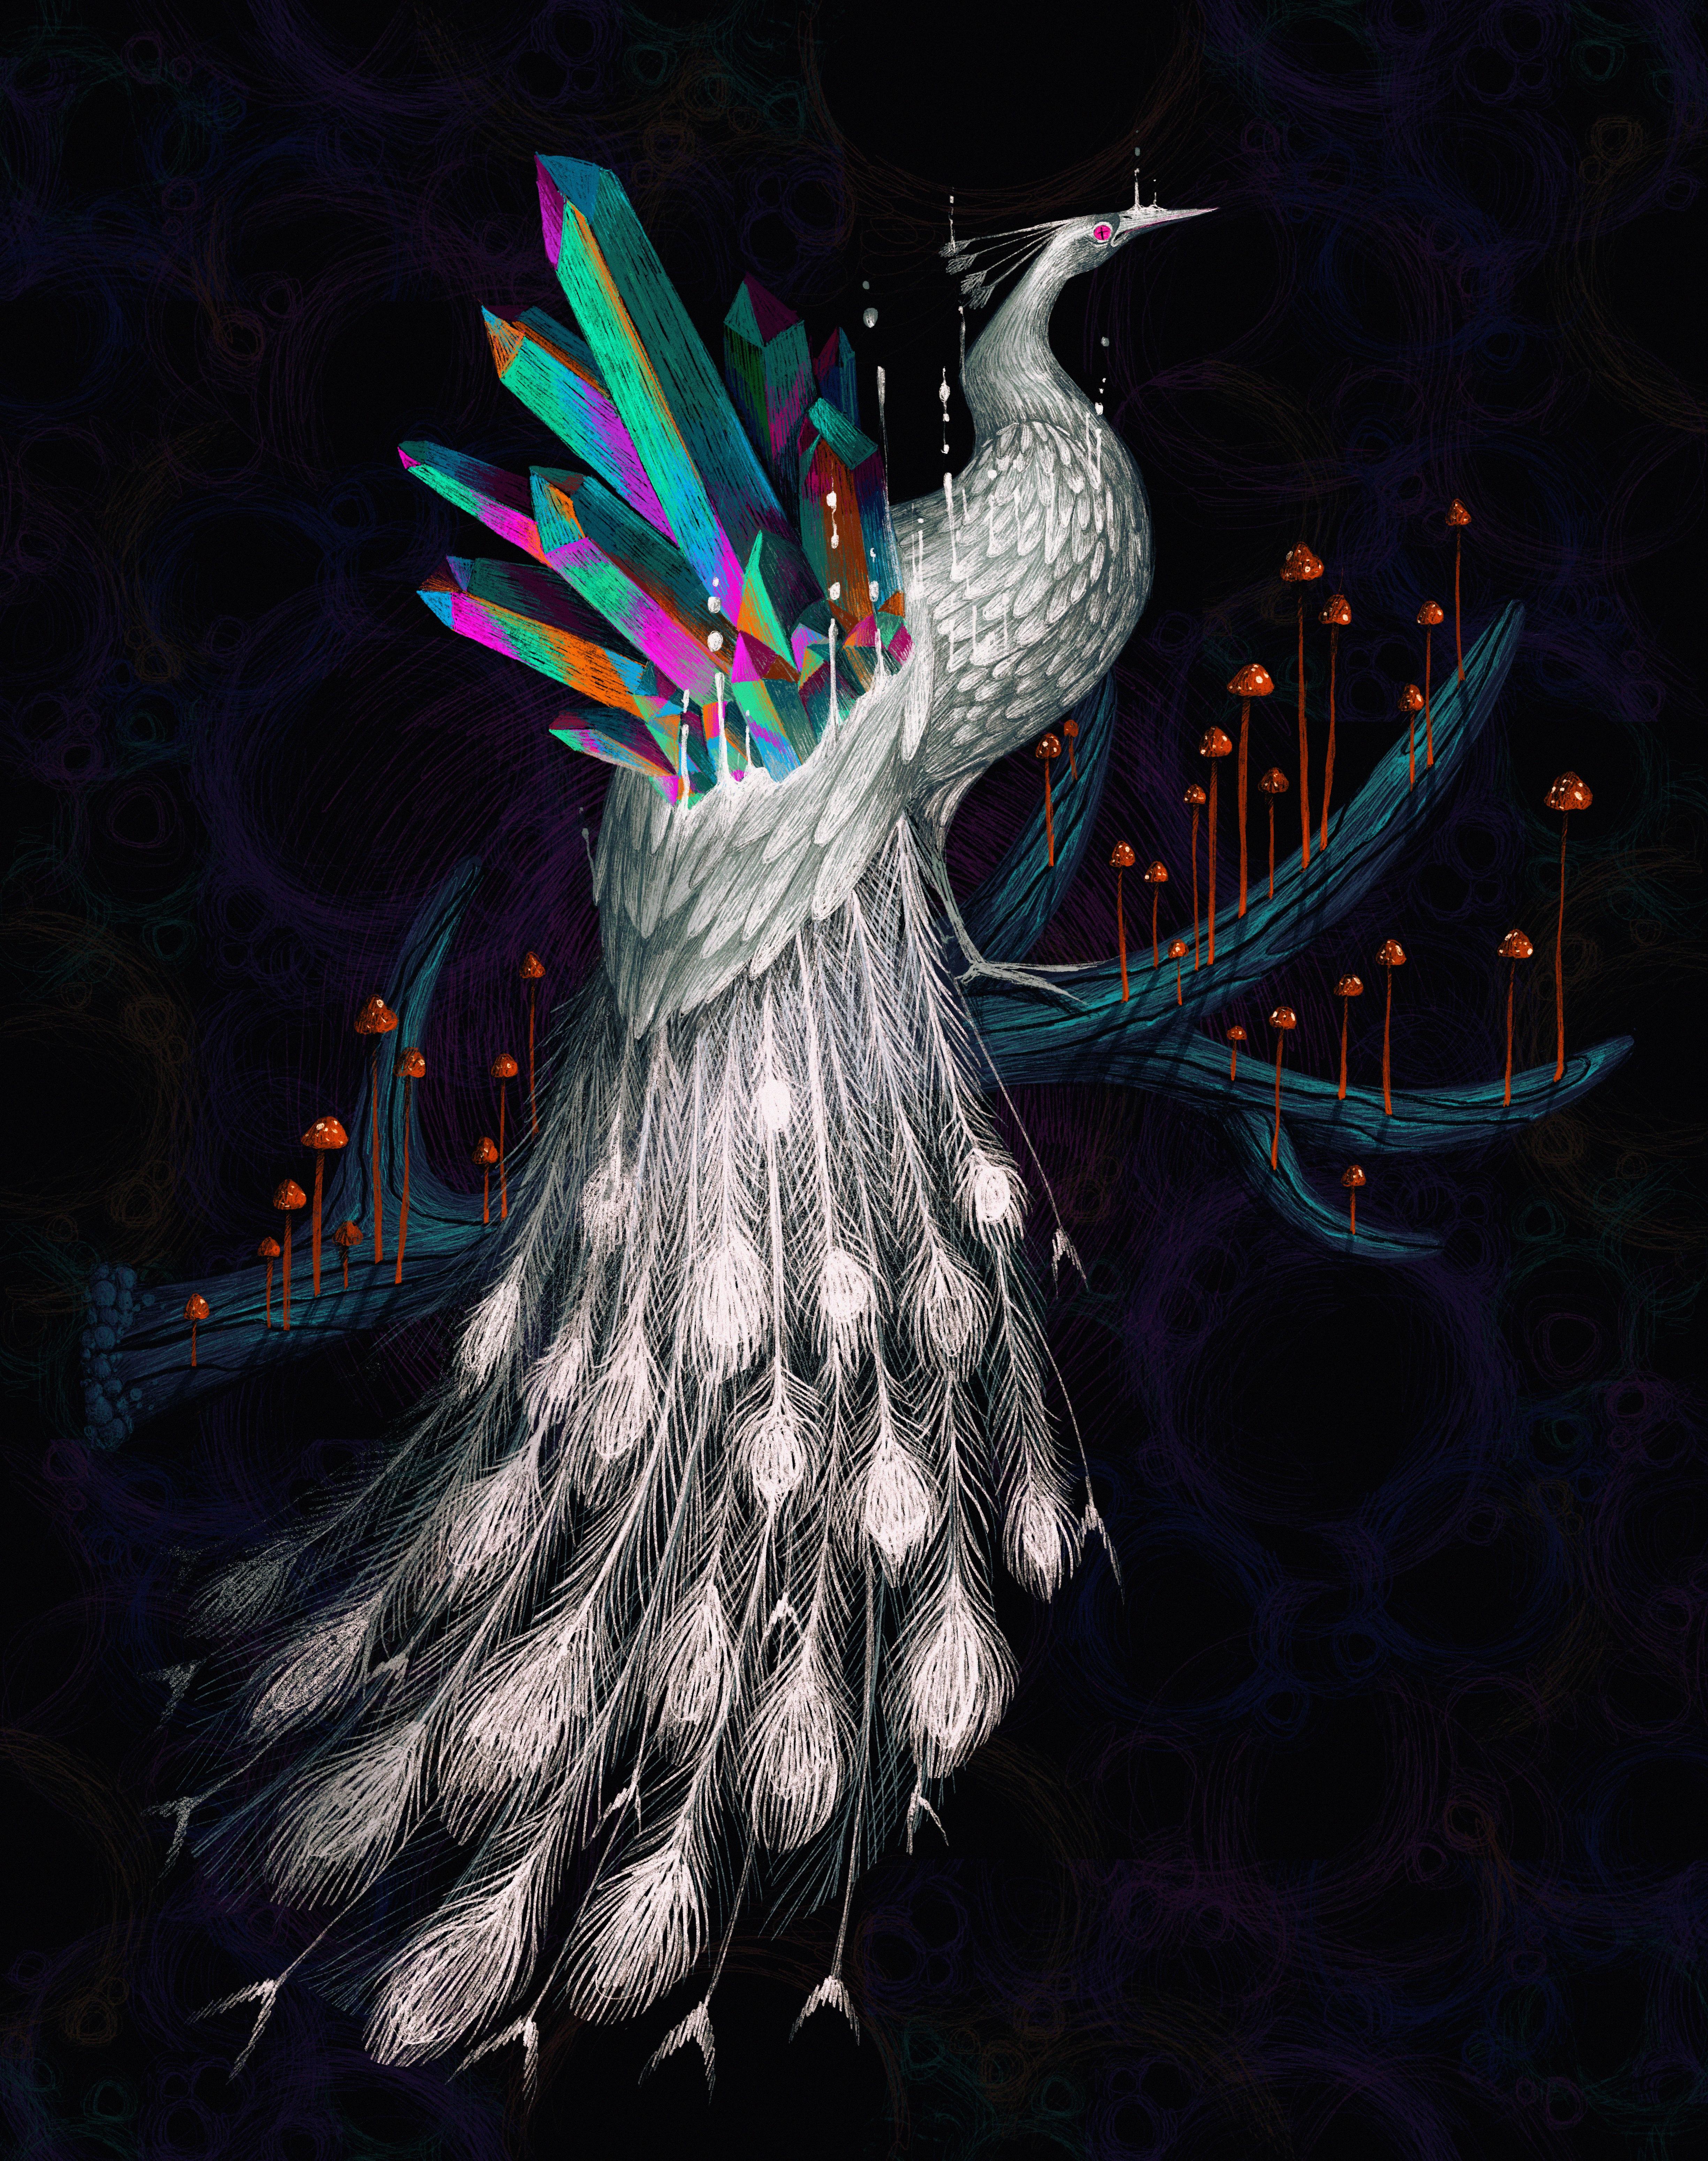 peacock-surreal-illustration